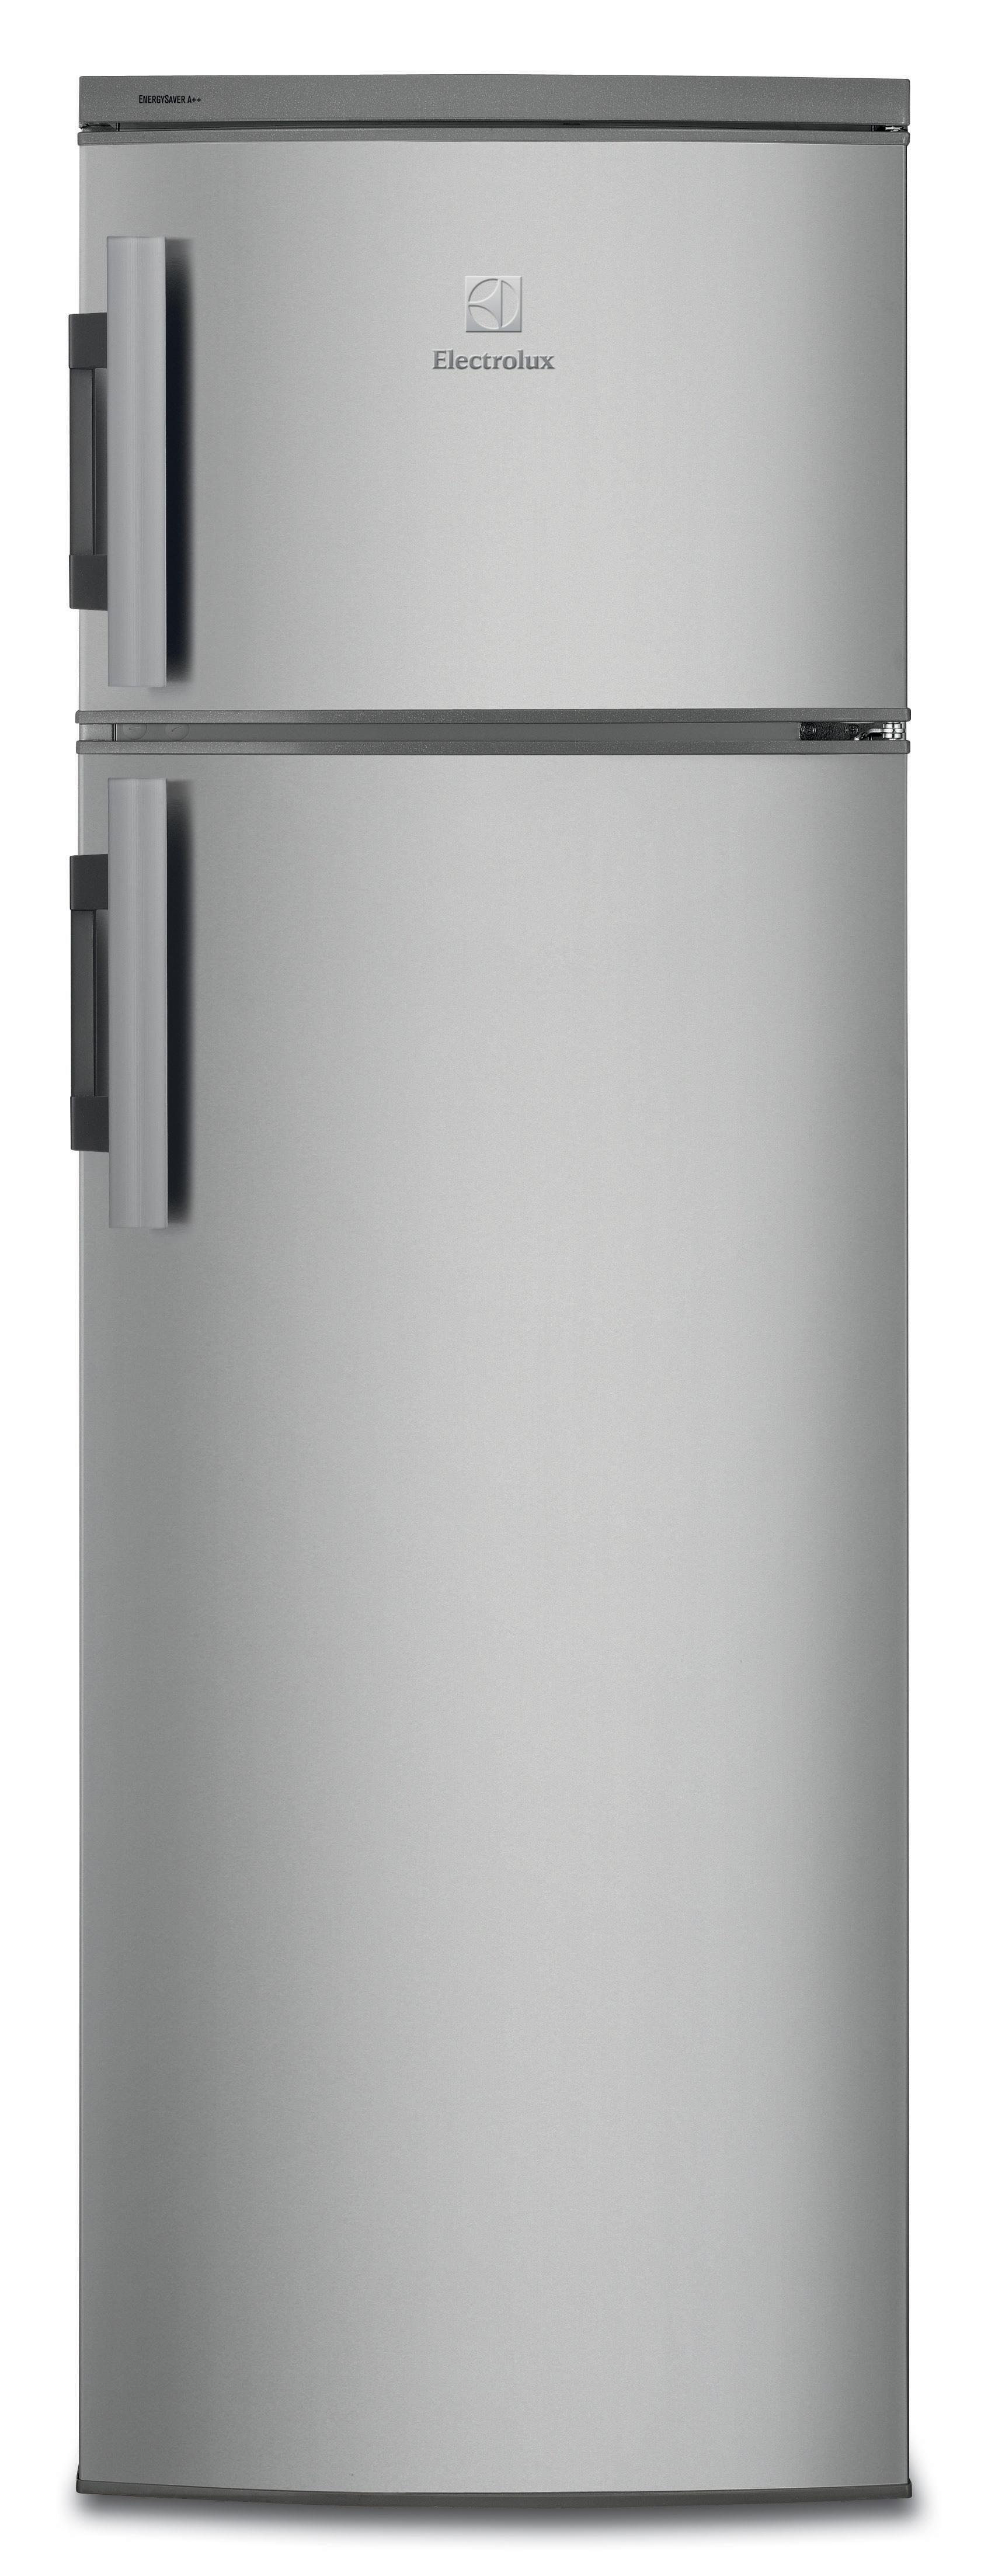 Electrolux EJ2302AOX2